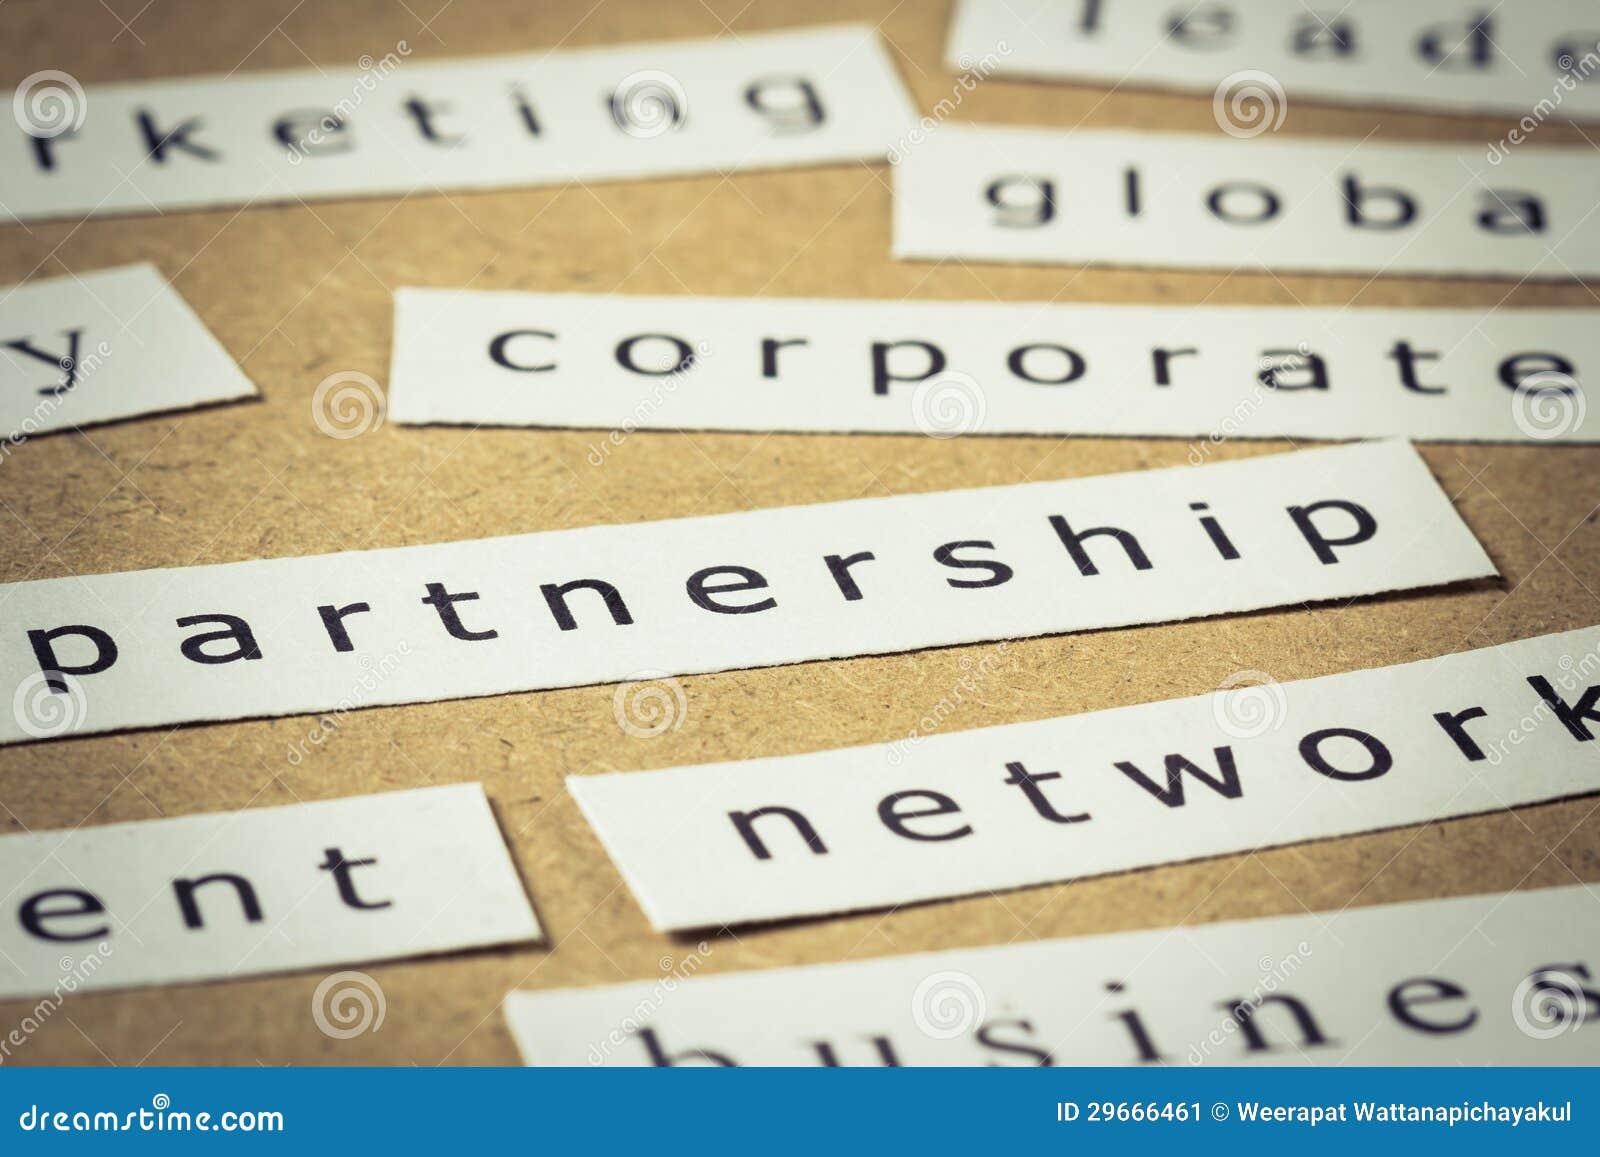 Partnership paper